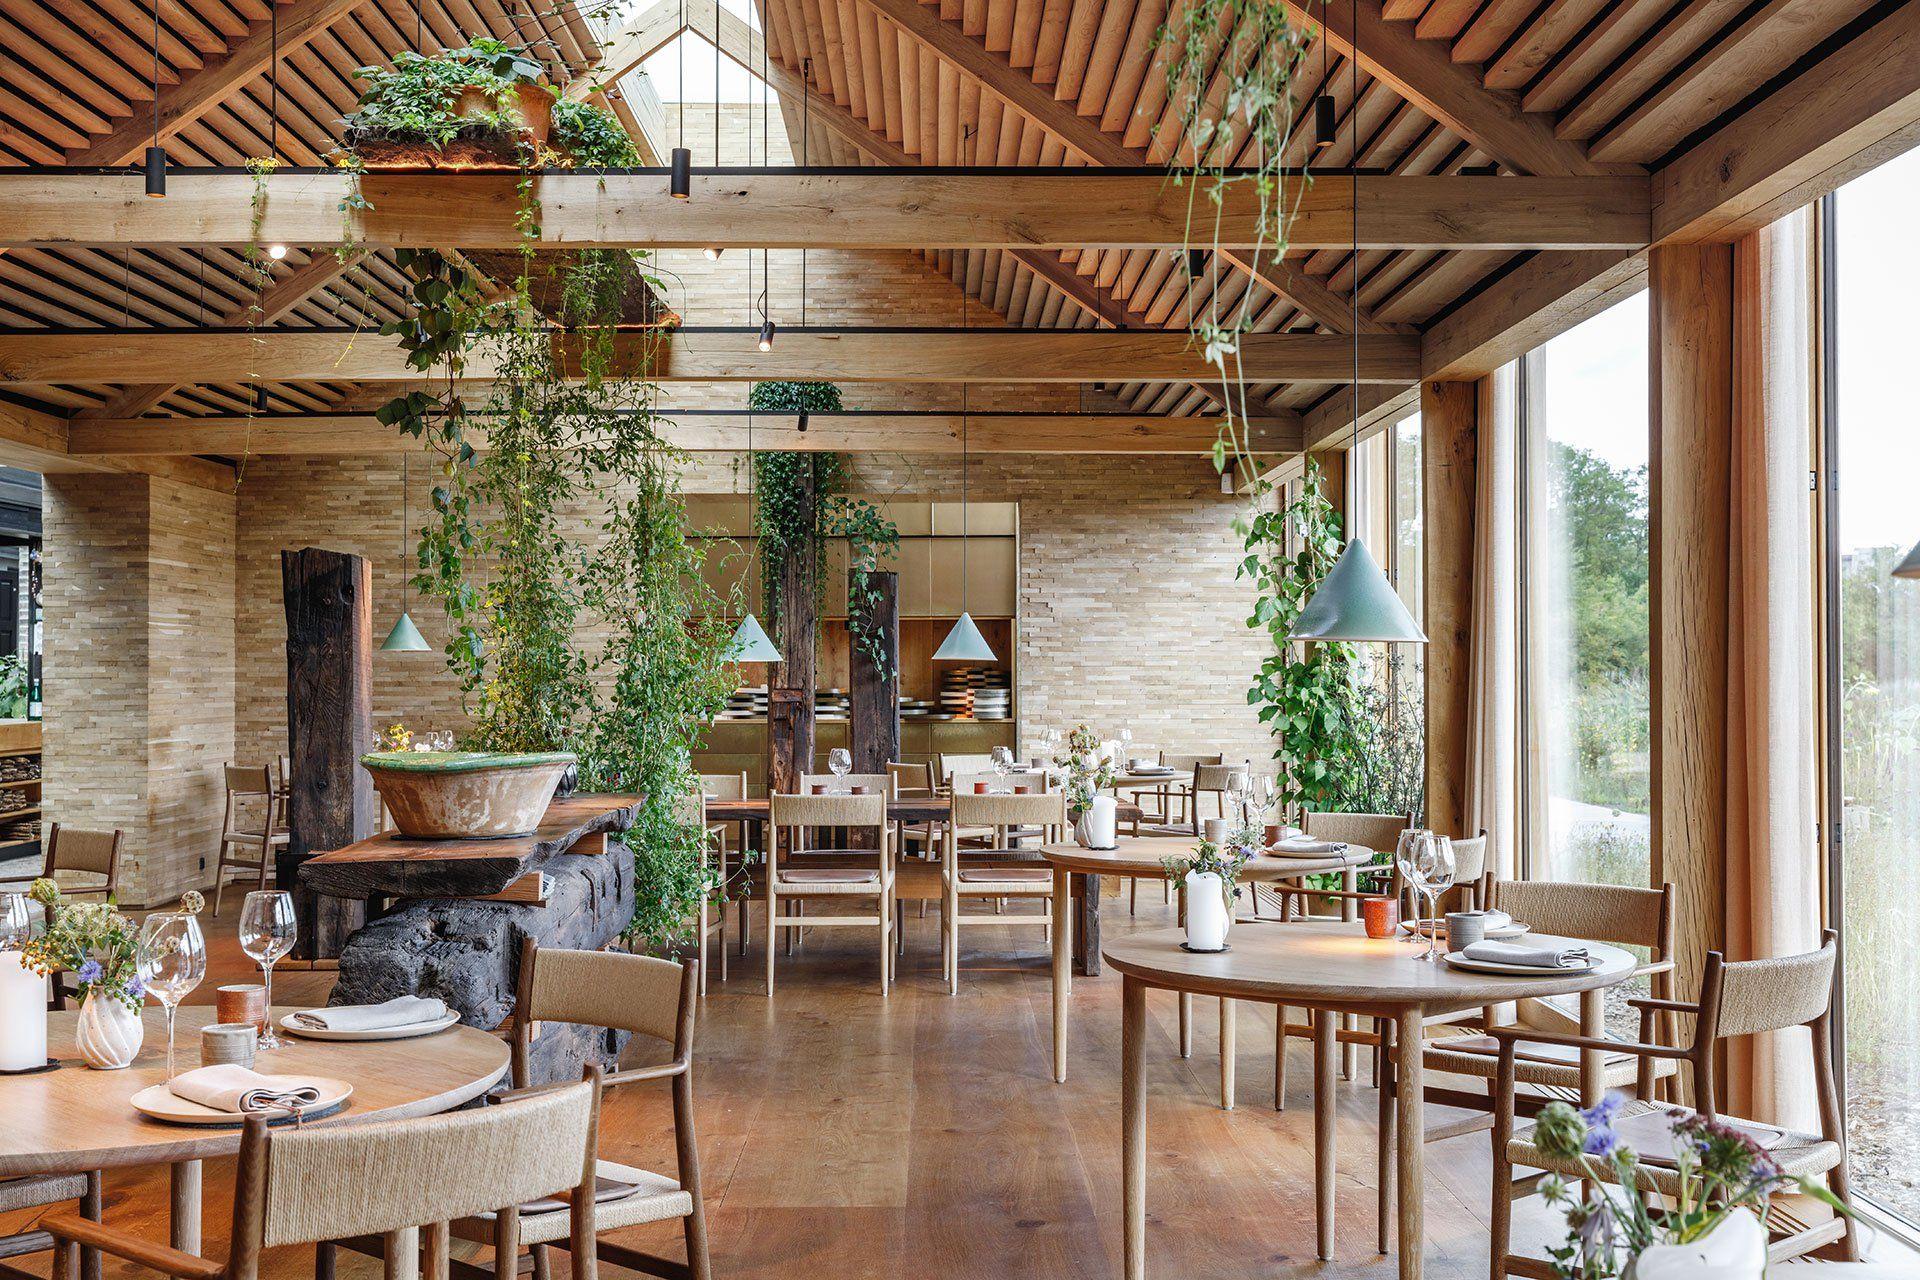 Noma Reinvented Rustic Modernism Meets Scandinavian Authenticity Yatzer Noma Restaurant Restaurant Interior Design Restaurant Design